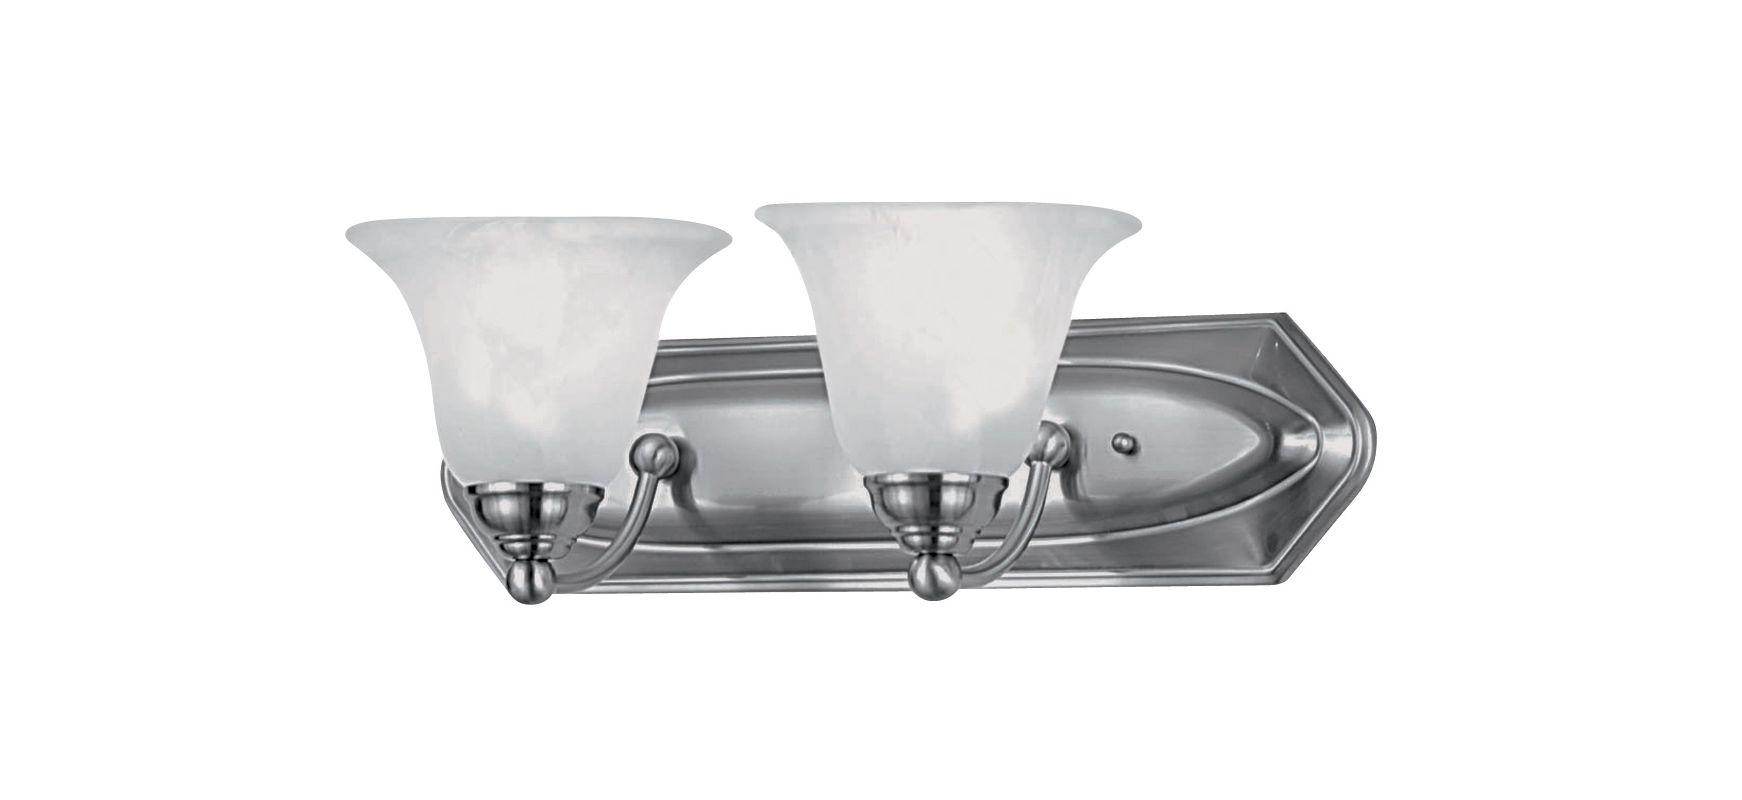 DVI Lighting DVP41802 Diamond 2 Light Incandescent Bathroom Vanity